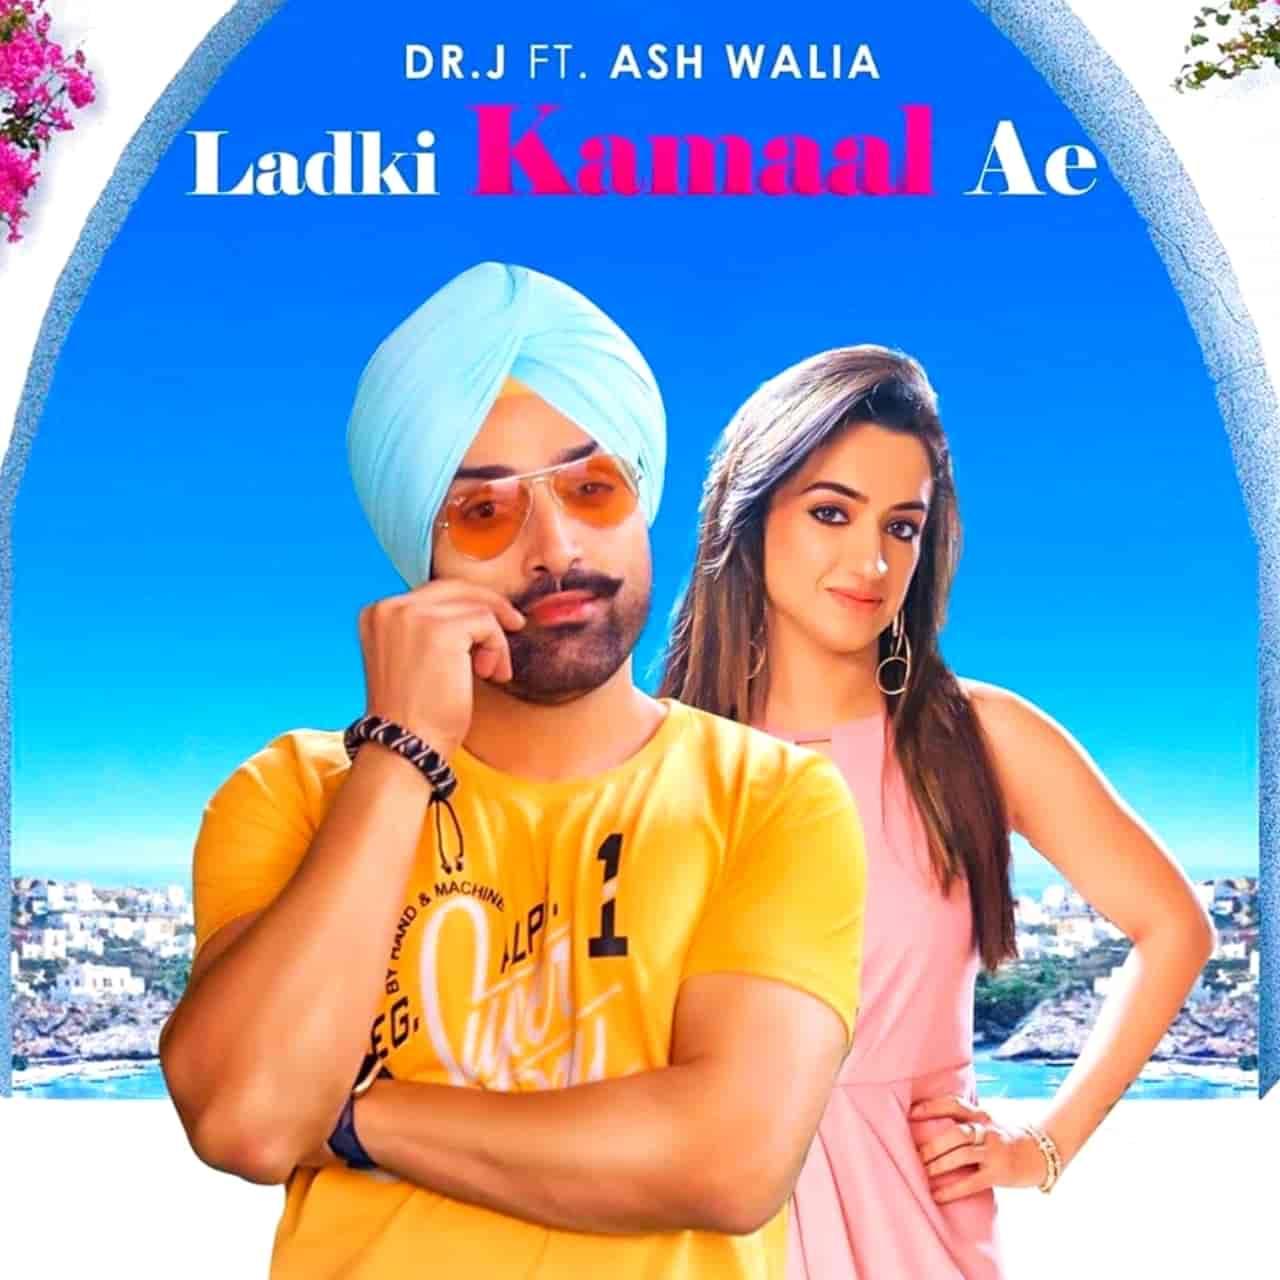 Ladki Kamaal Ae Punjabi Song Images By Dr. J feat. Ash Walia